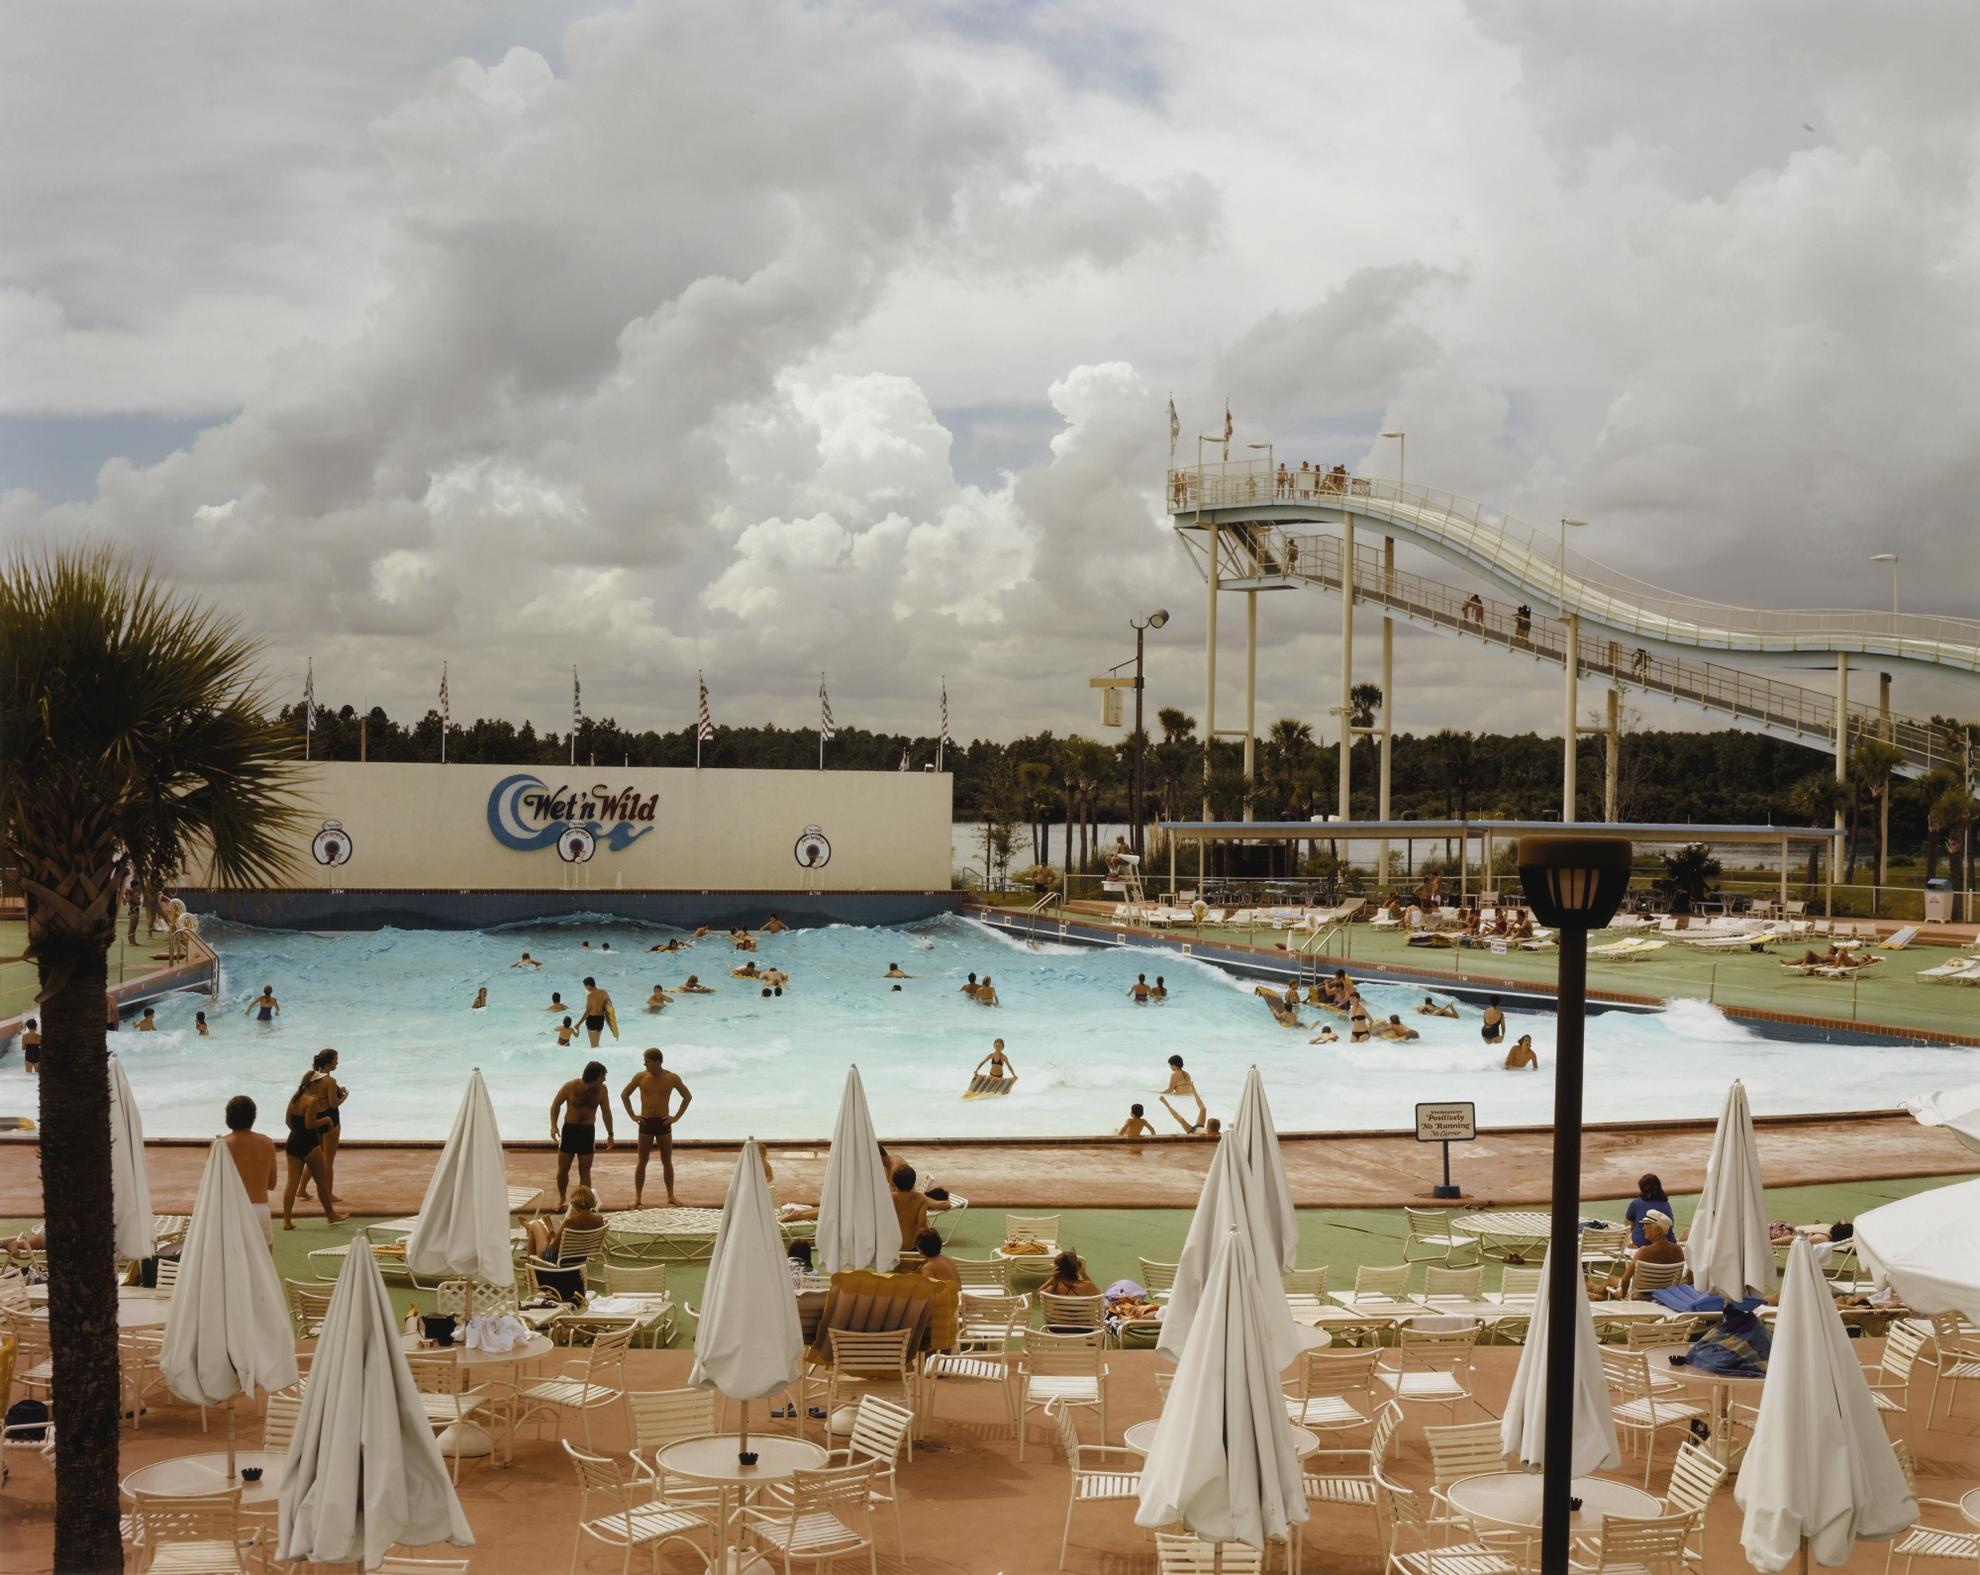 Joel Sternfeld-Wet N Wild Aquatic Theme Park, Orlando, Florida, September 1980-1980